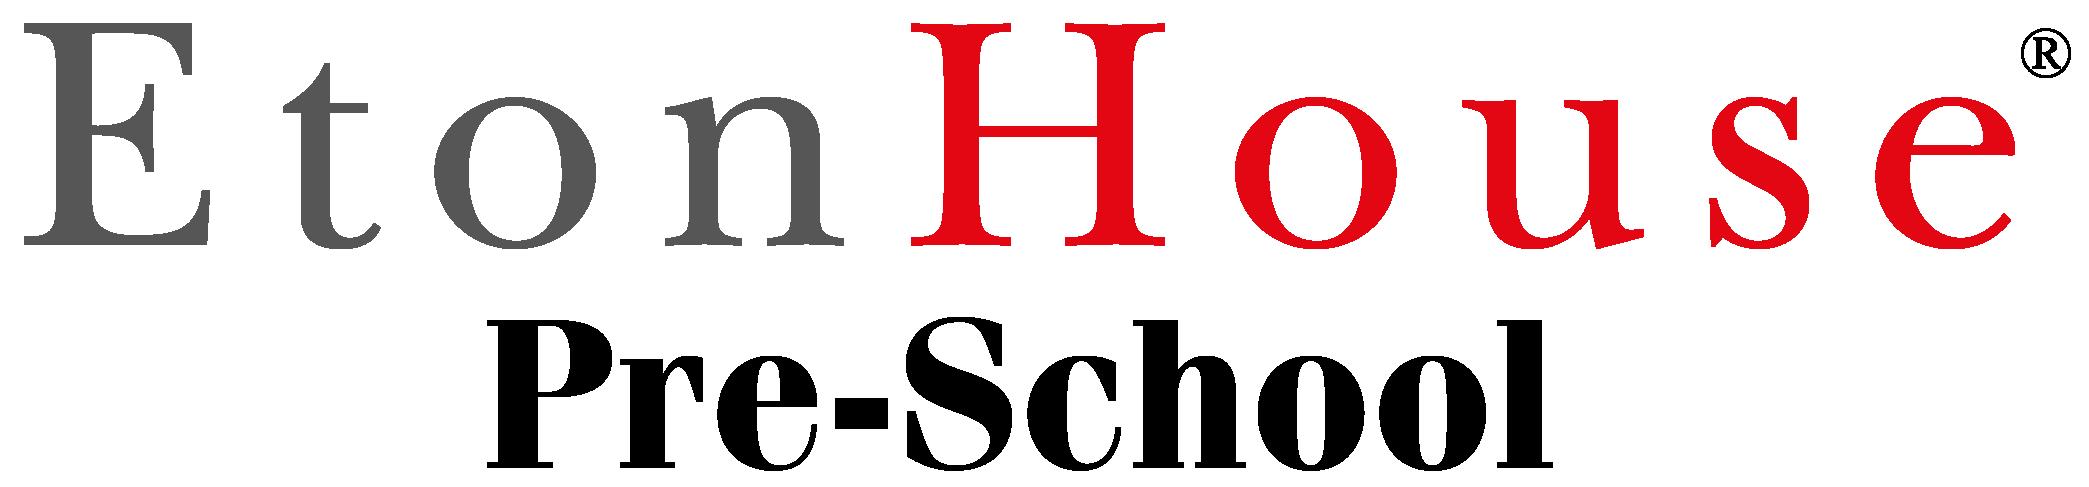 EtonHouse Pre-School Logo